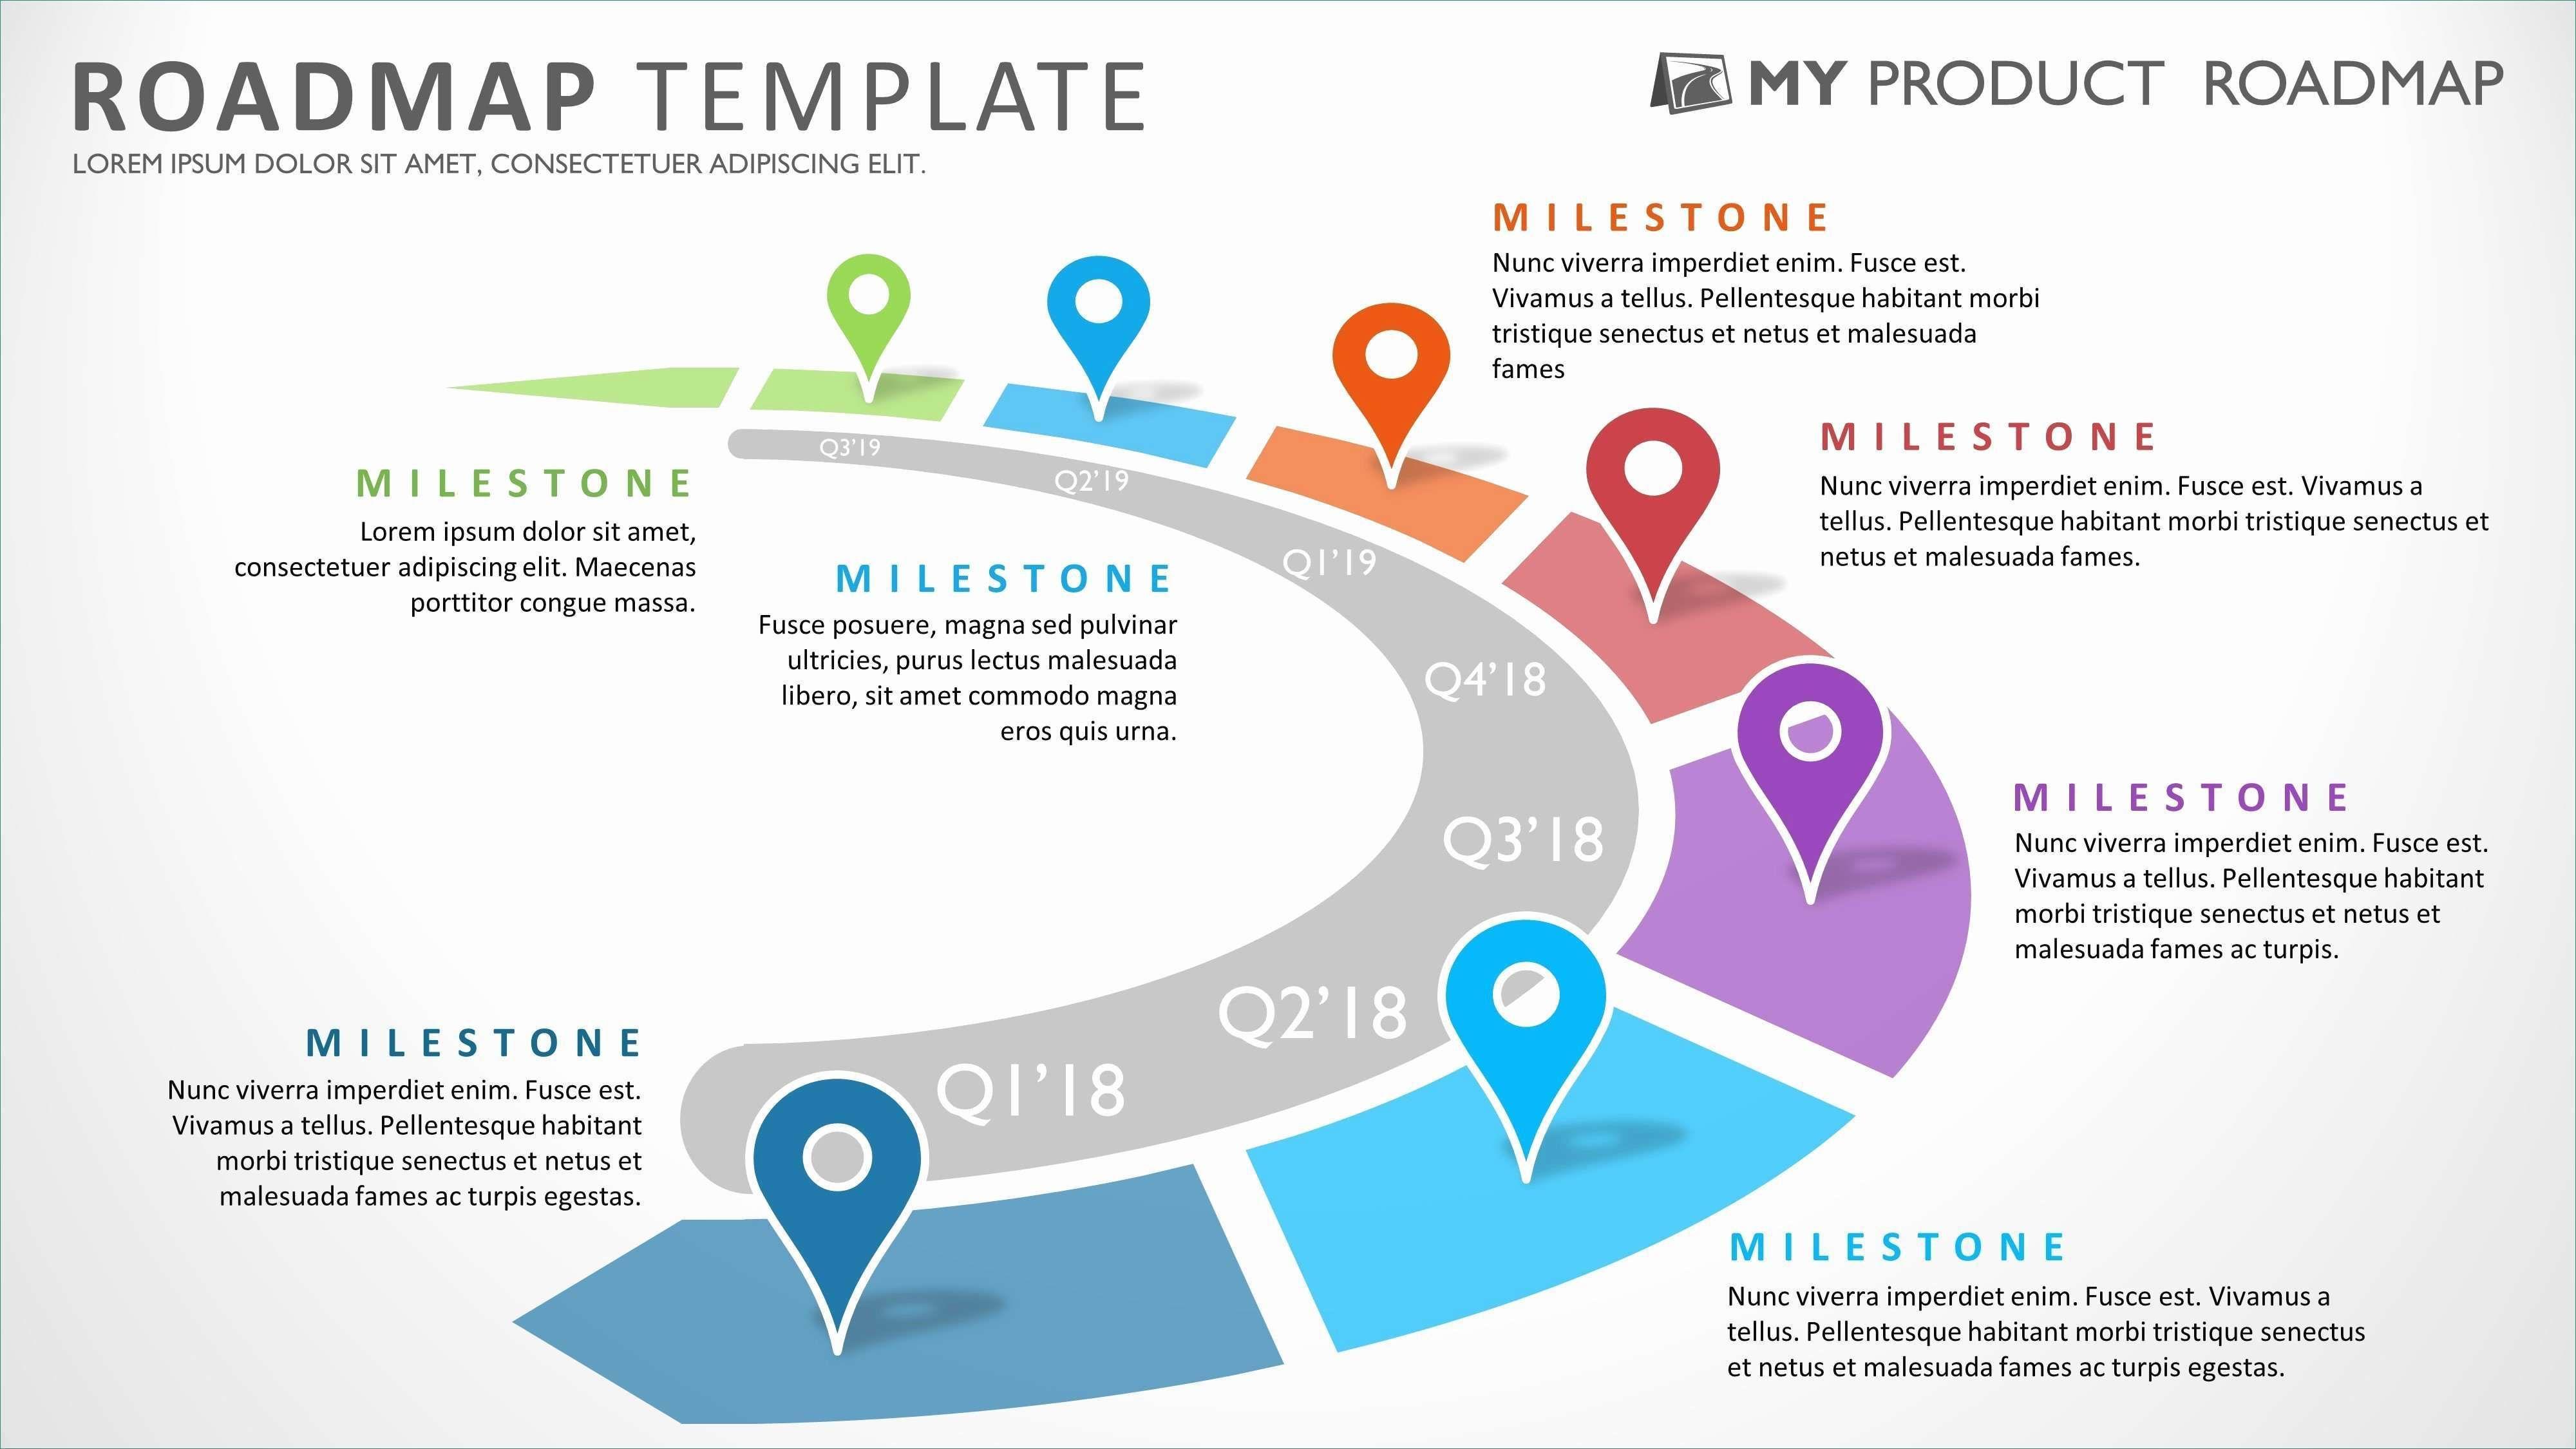 It Roadmap Template Powerpoint Thatll Beautifully Match Your Needs These It Roadmap Template Pow Roadmap Template Roadmap Infographic Product Roadmap Template